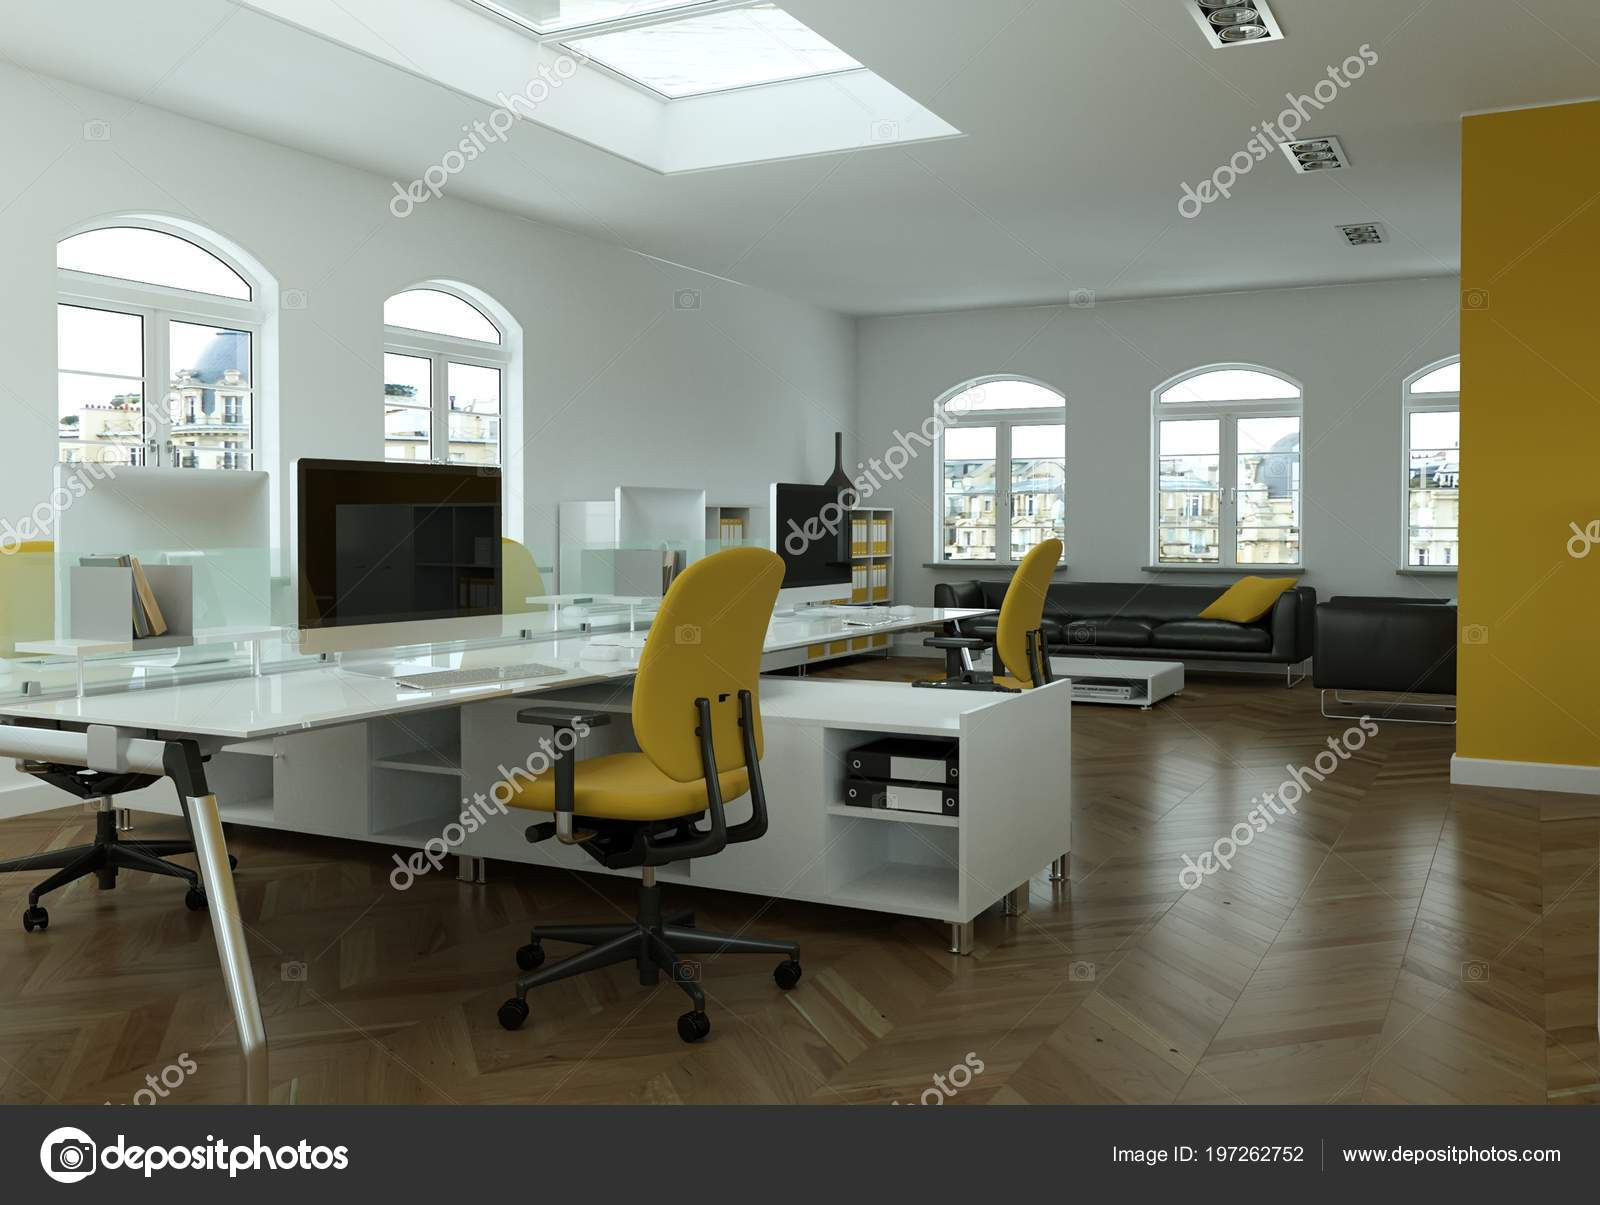 Bureau jaune moderne design d intérieur d rendering